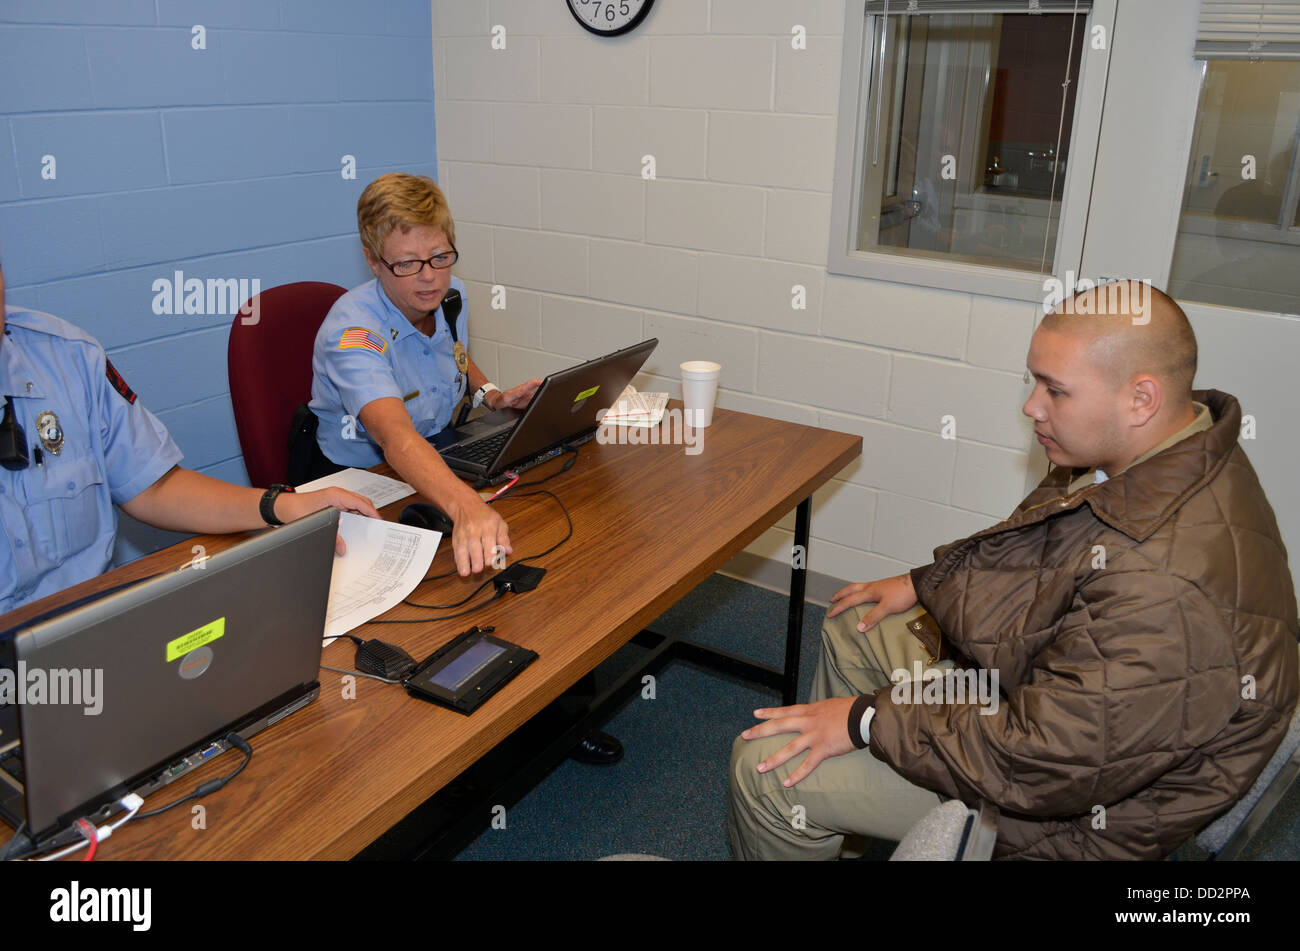 Disciplinary hearing for a juvenile inmate at the Nebraska Correctional Youth Facility in Omaha, Nebraska. - Stock Image